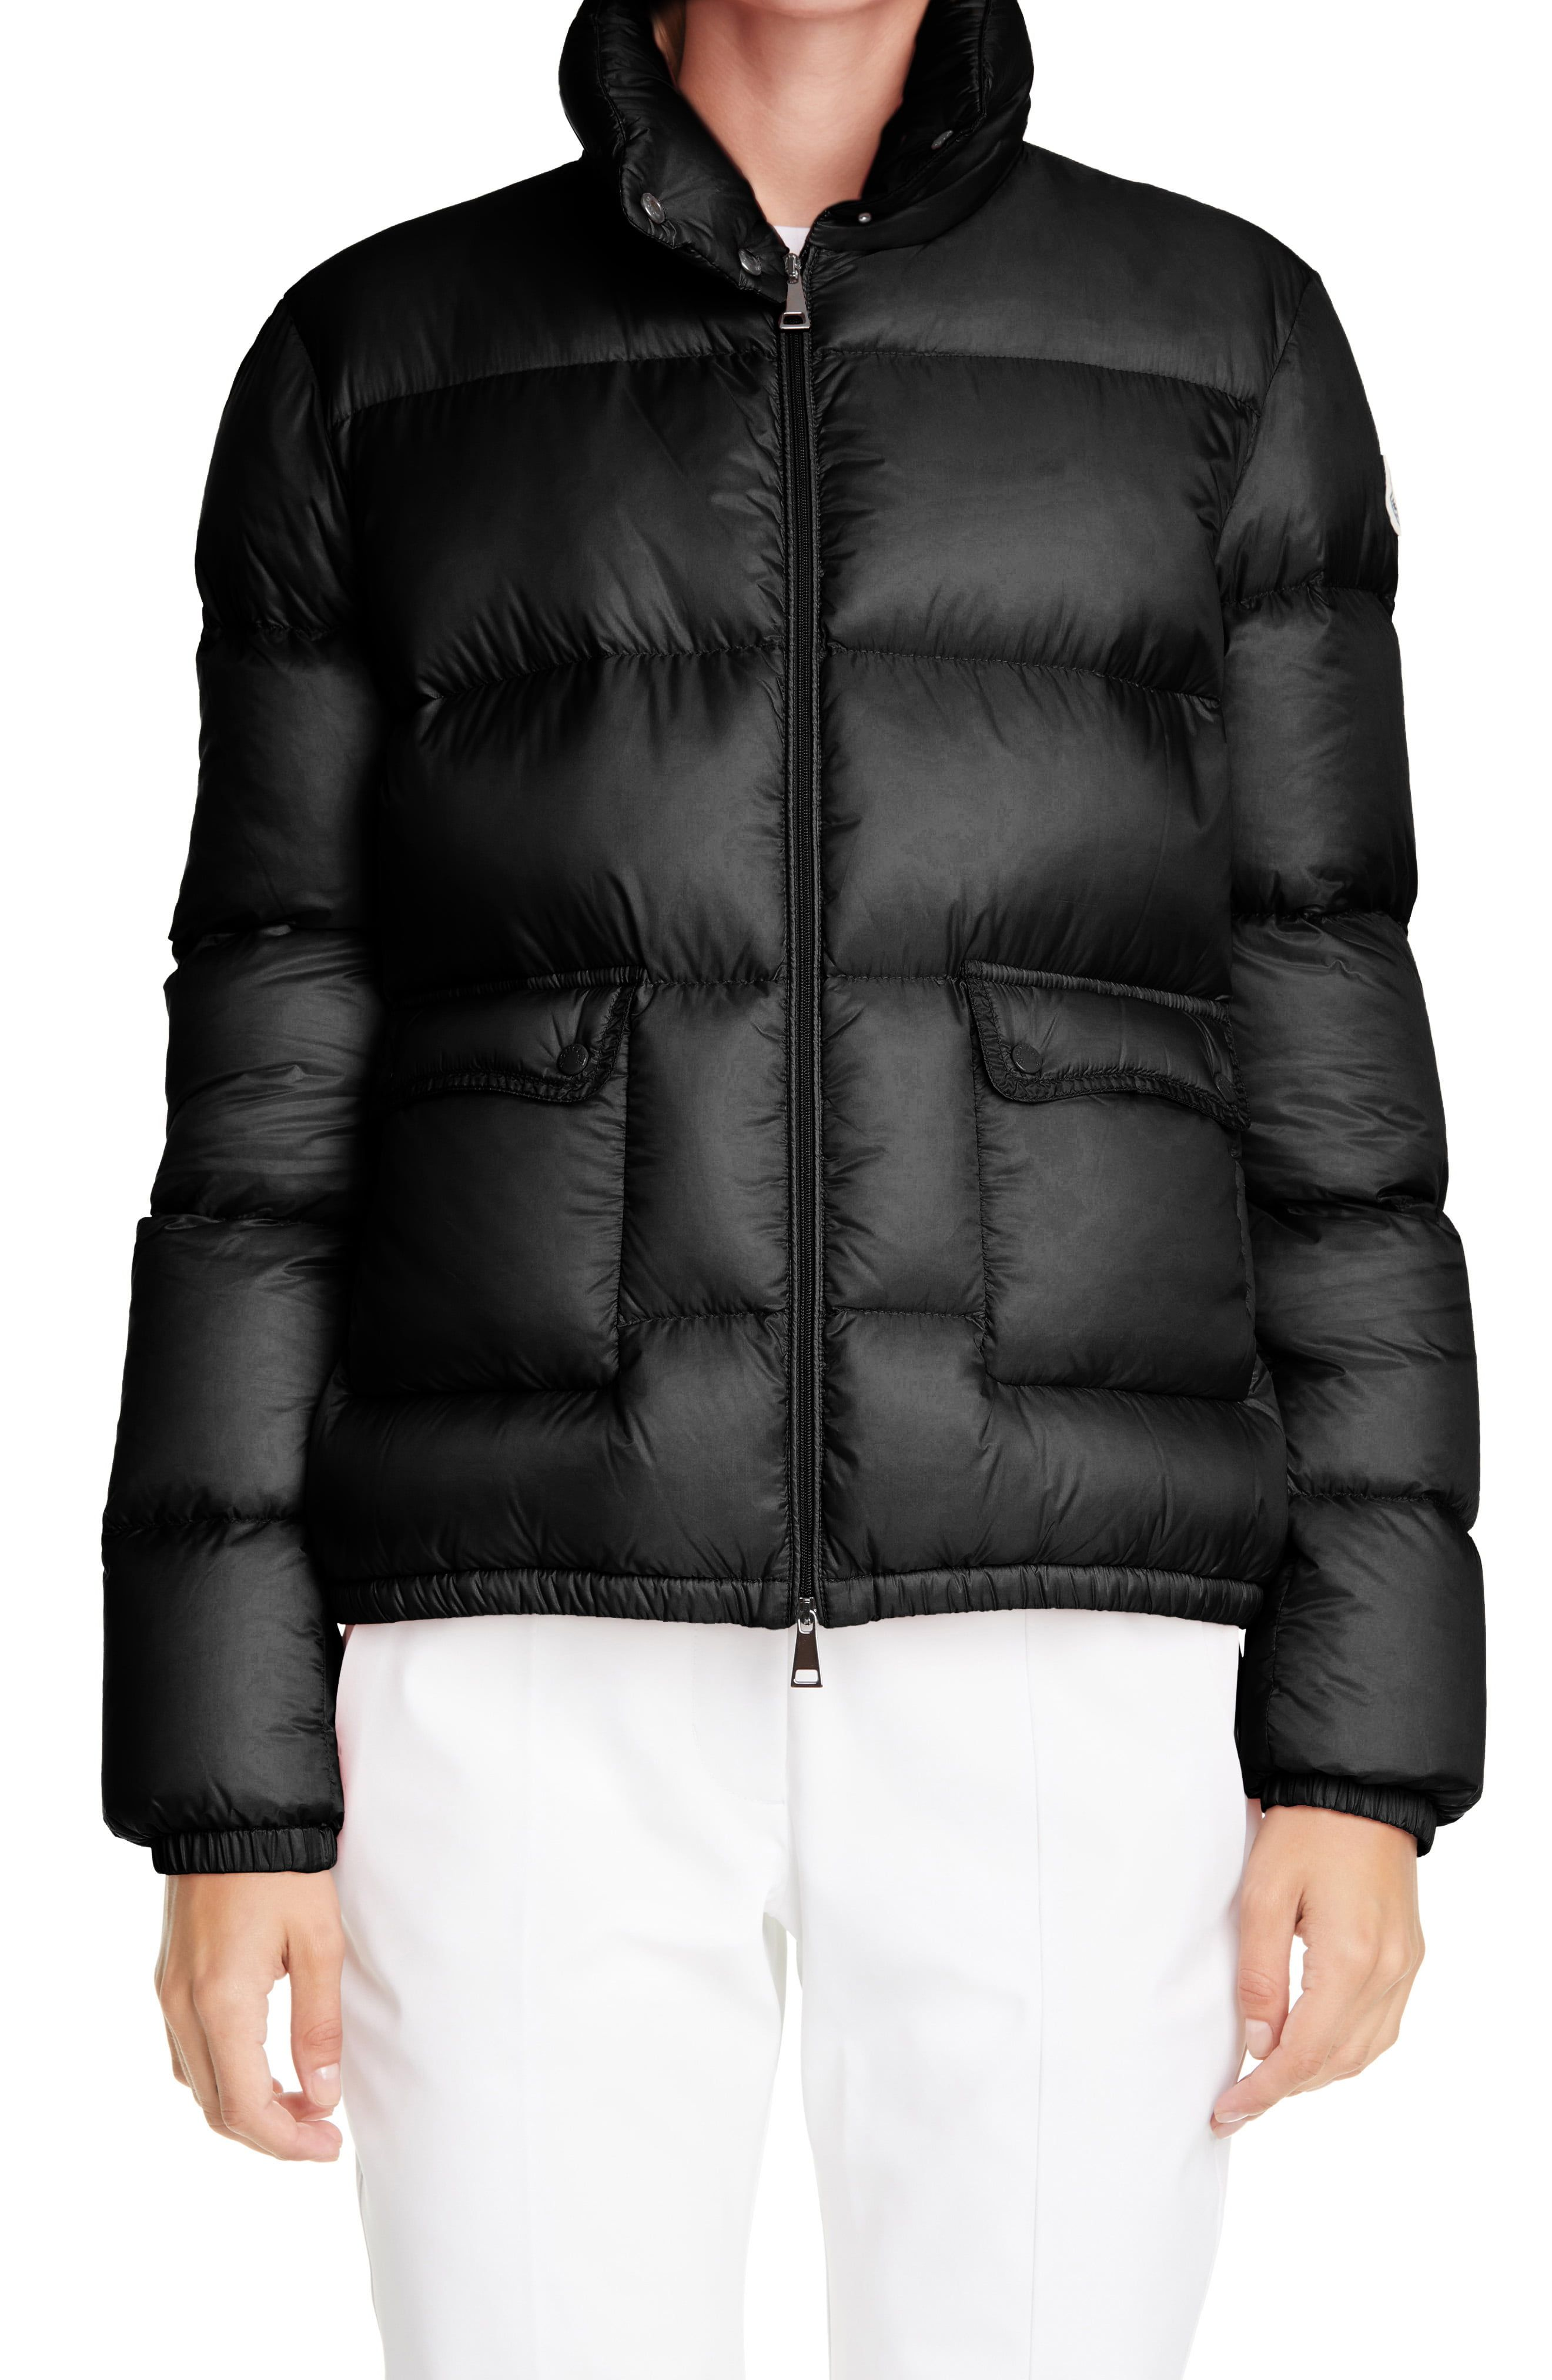 Moncler Lannic Water Resistant Lightweight Down Puffer Jacket Nordstrom In 2021 Moncler Jacket Women Puffer Jacket Black Moncler [ 4048 x 2640 Pixel ]